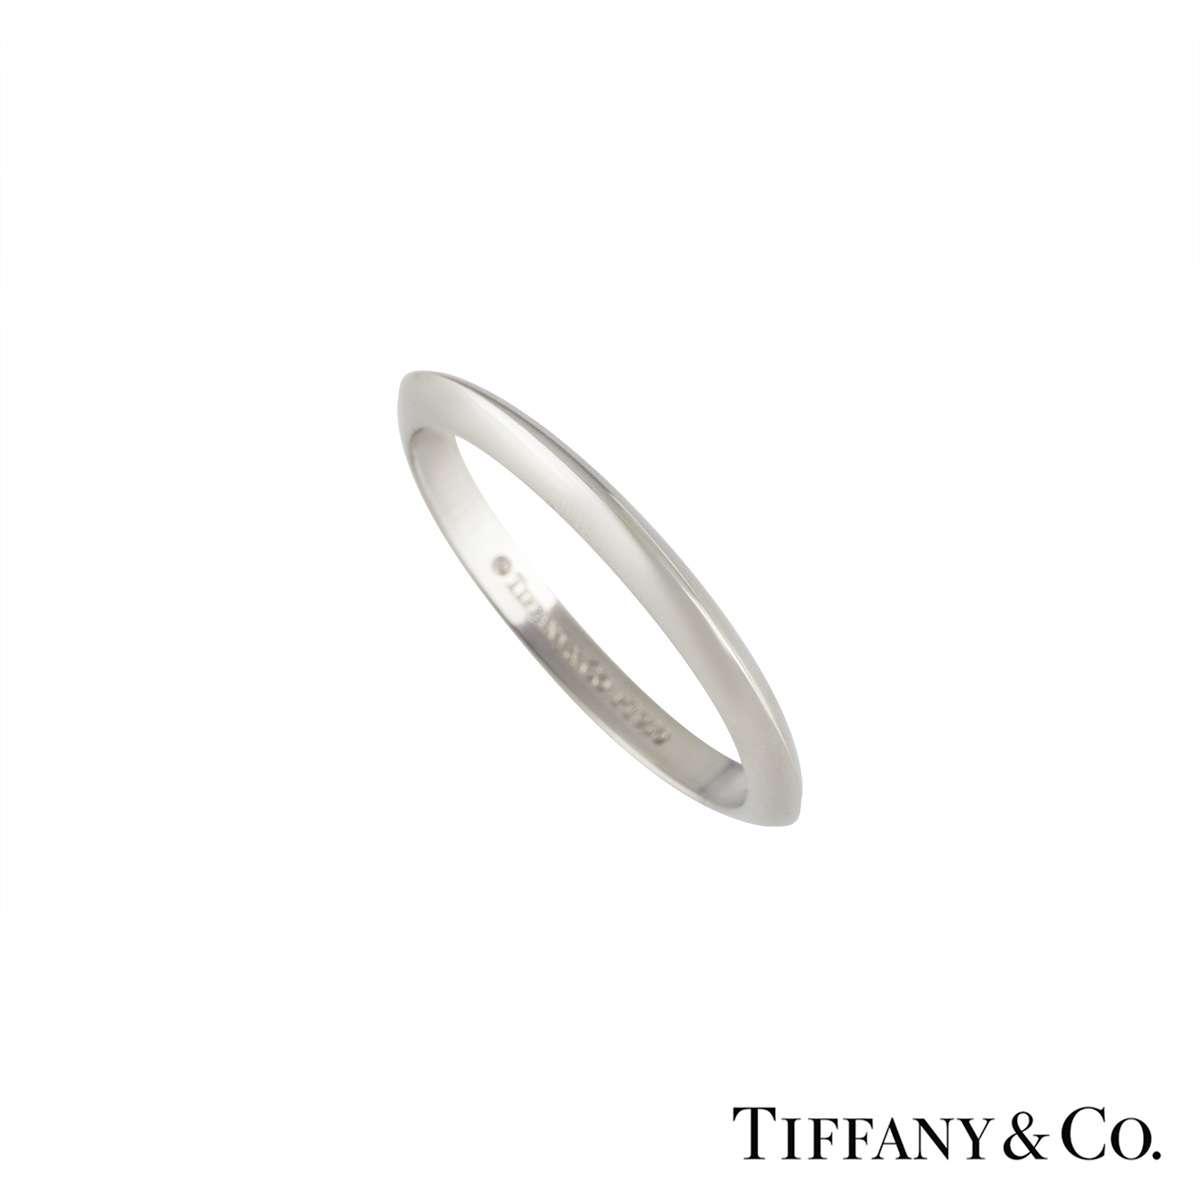 Tiffany & Co. Wedding Band in Platinum